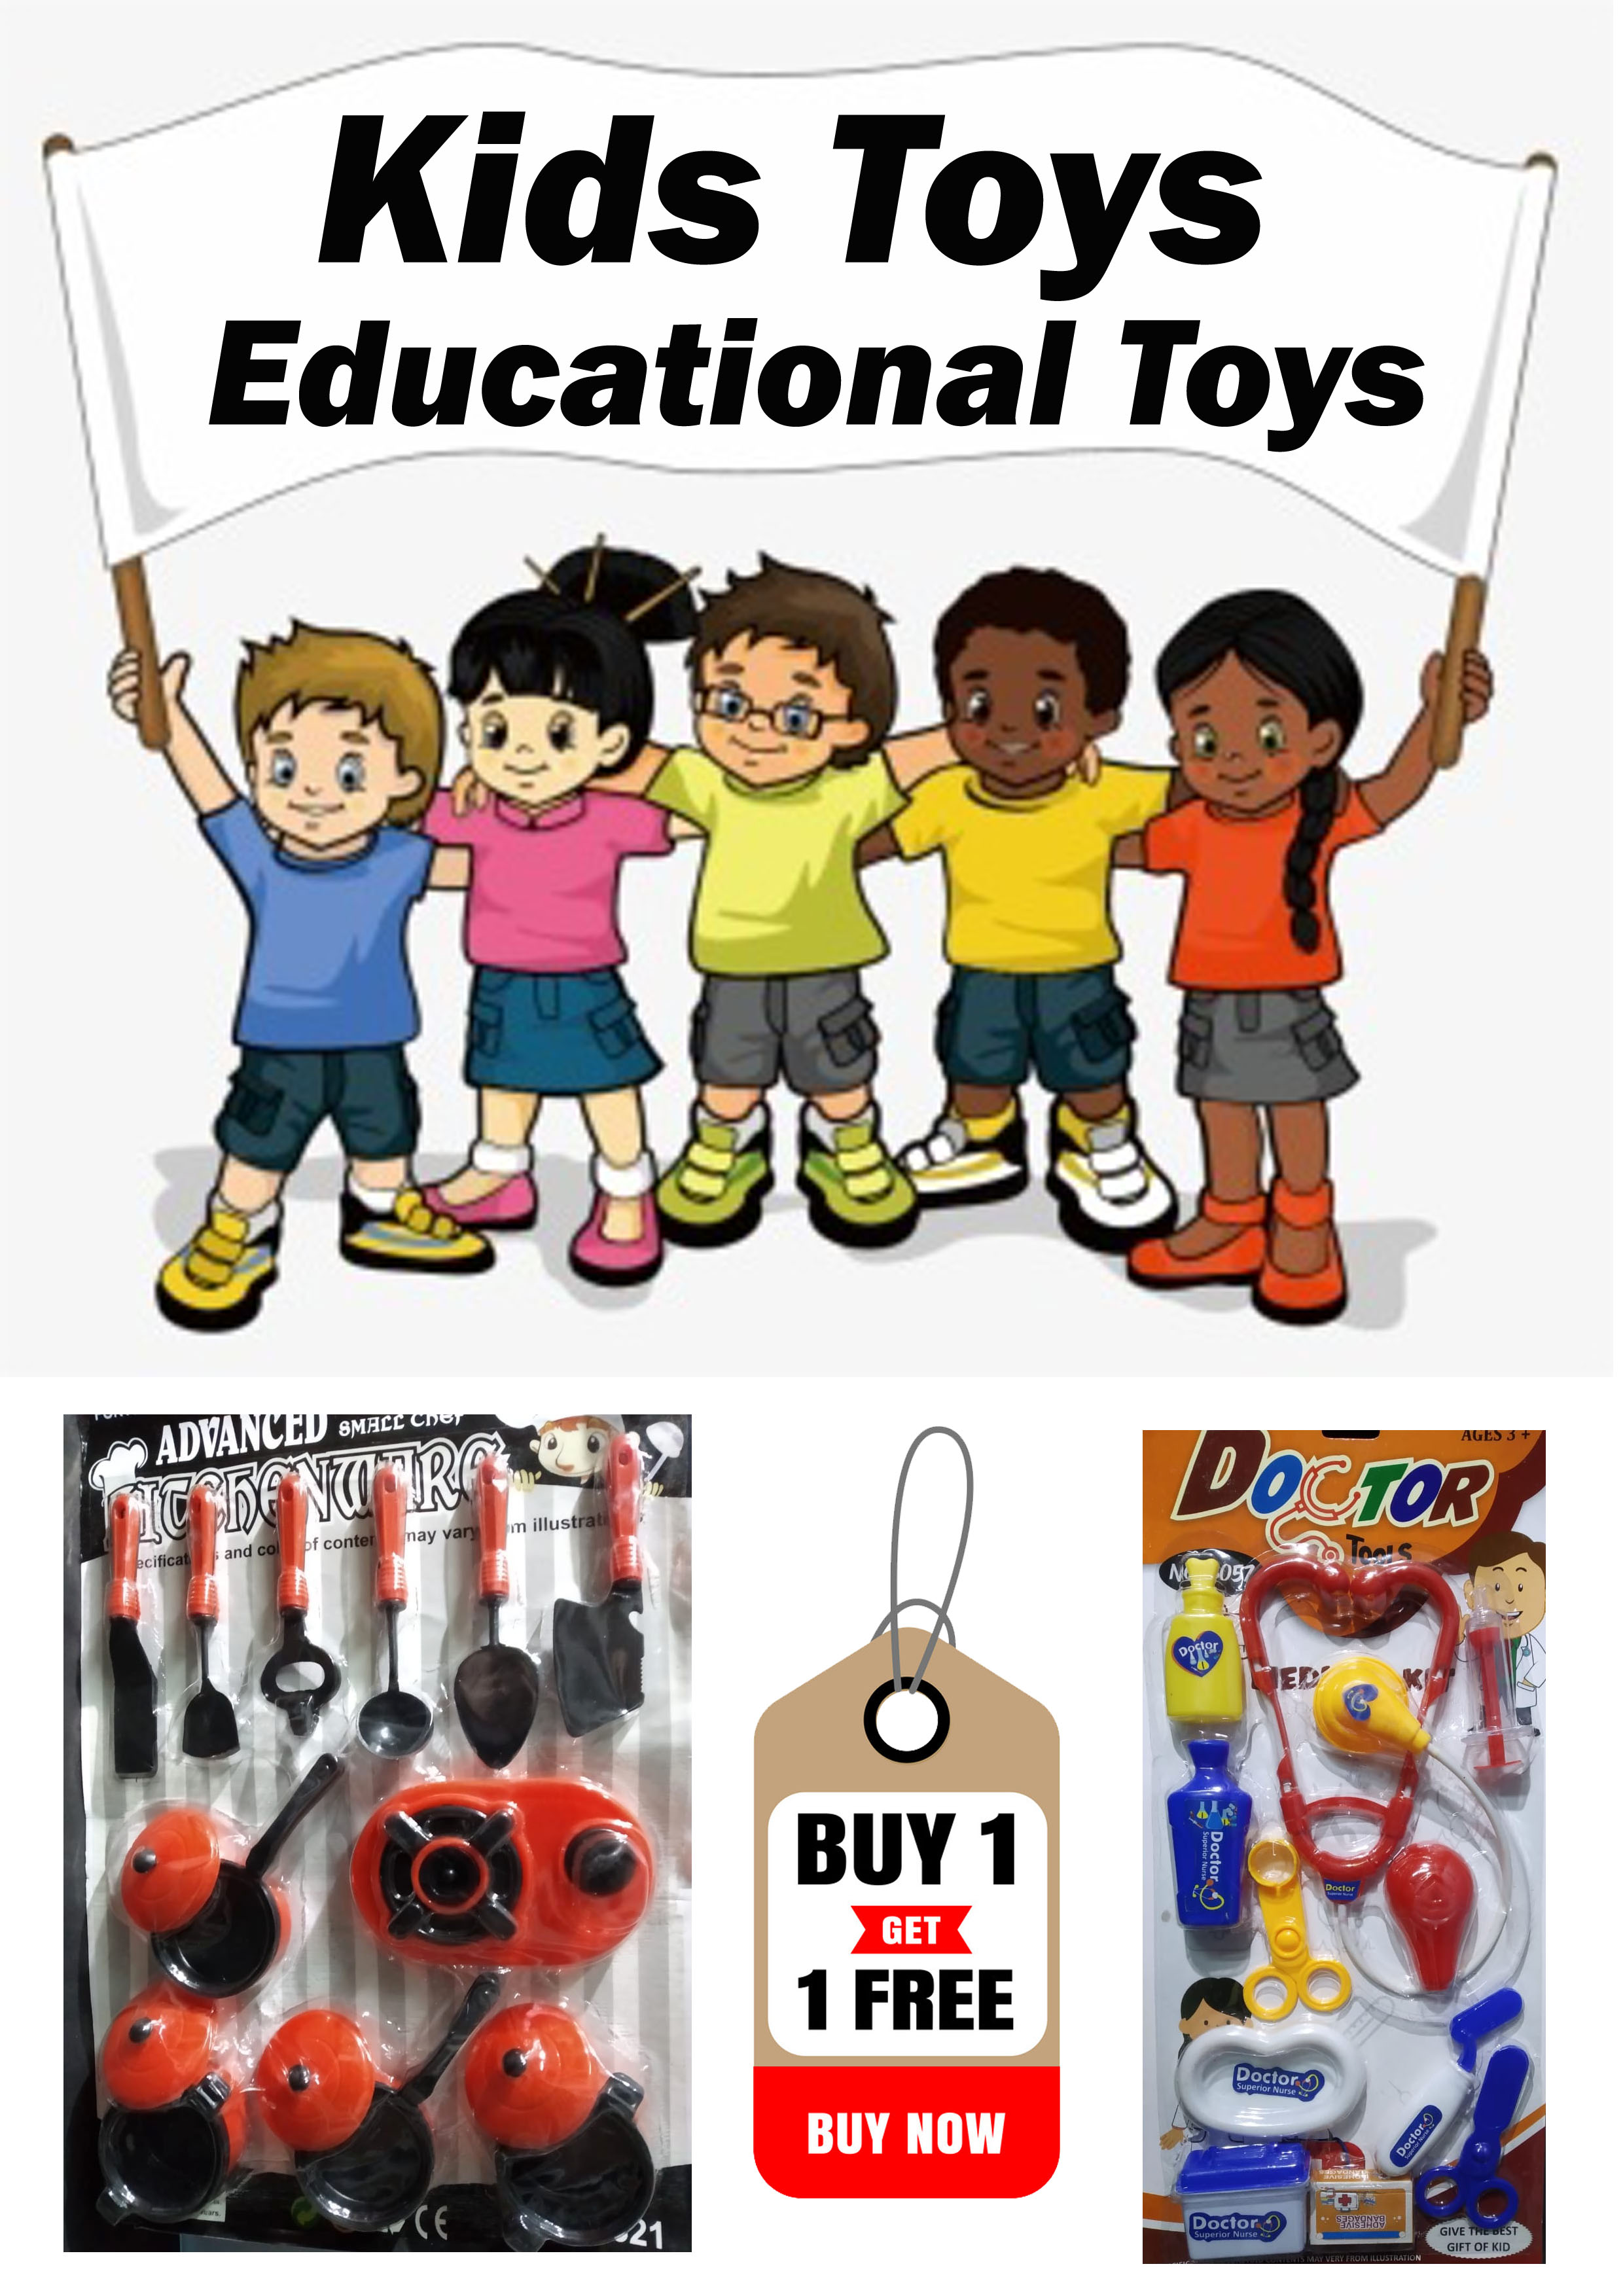 kids toys kitchen set + doctor set best gift item combo offer sale educationel toys girls toys boys toys